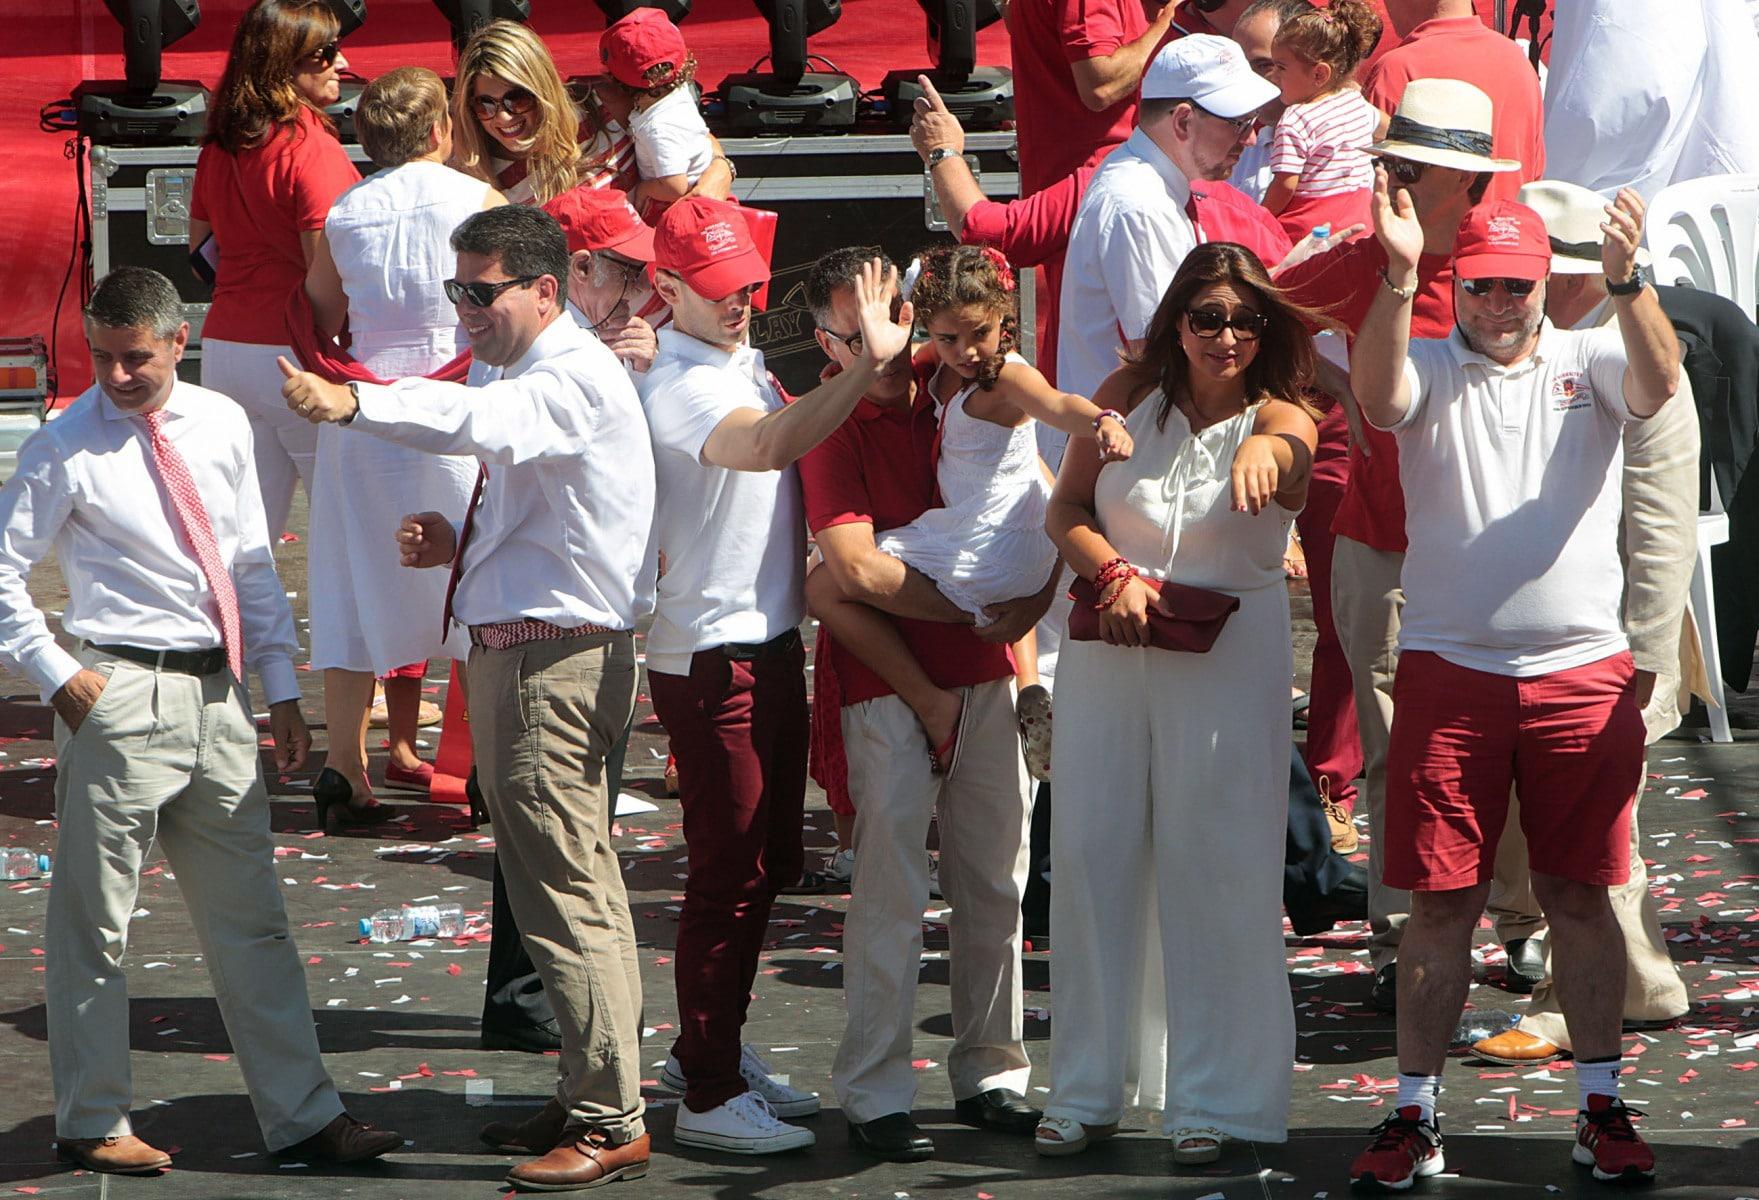 160910-national-day-gibraltar-2016-81_29495002152_o